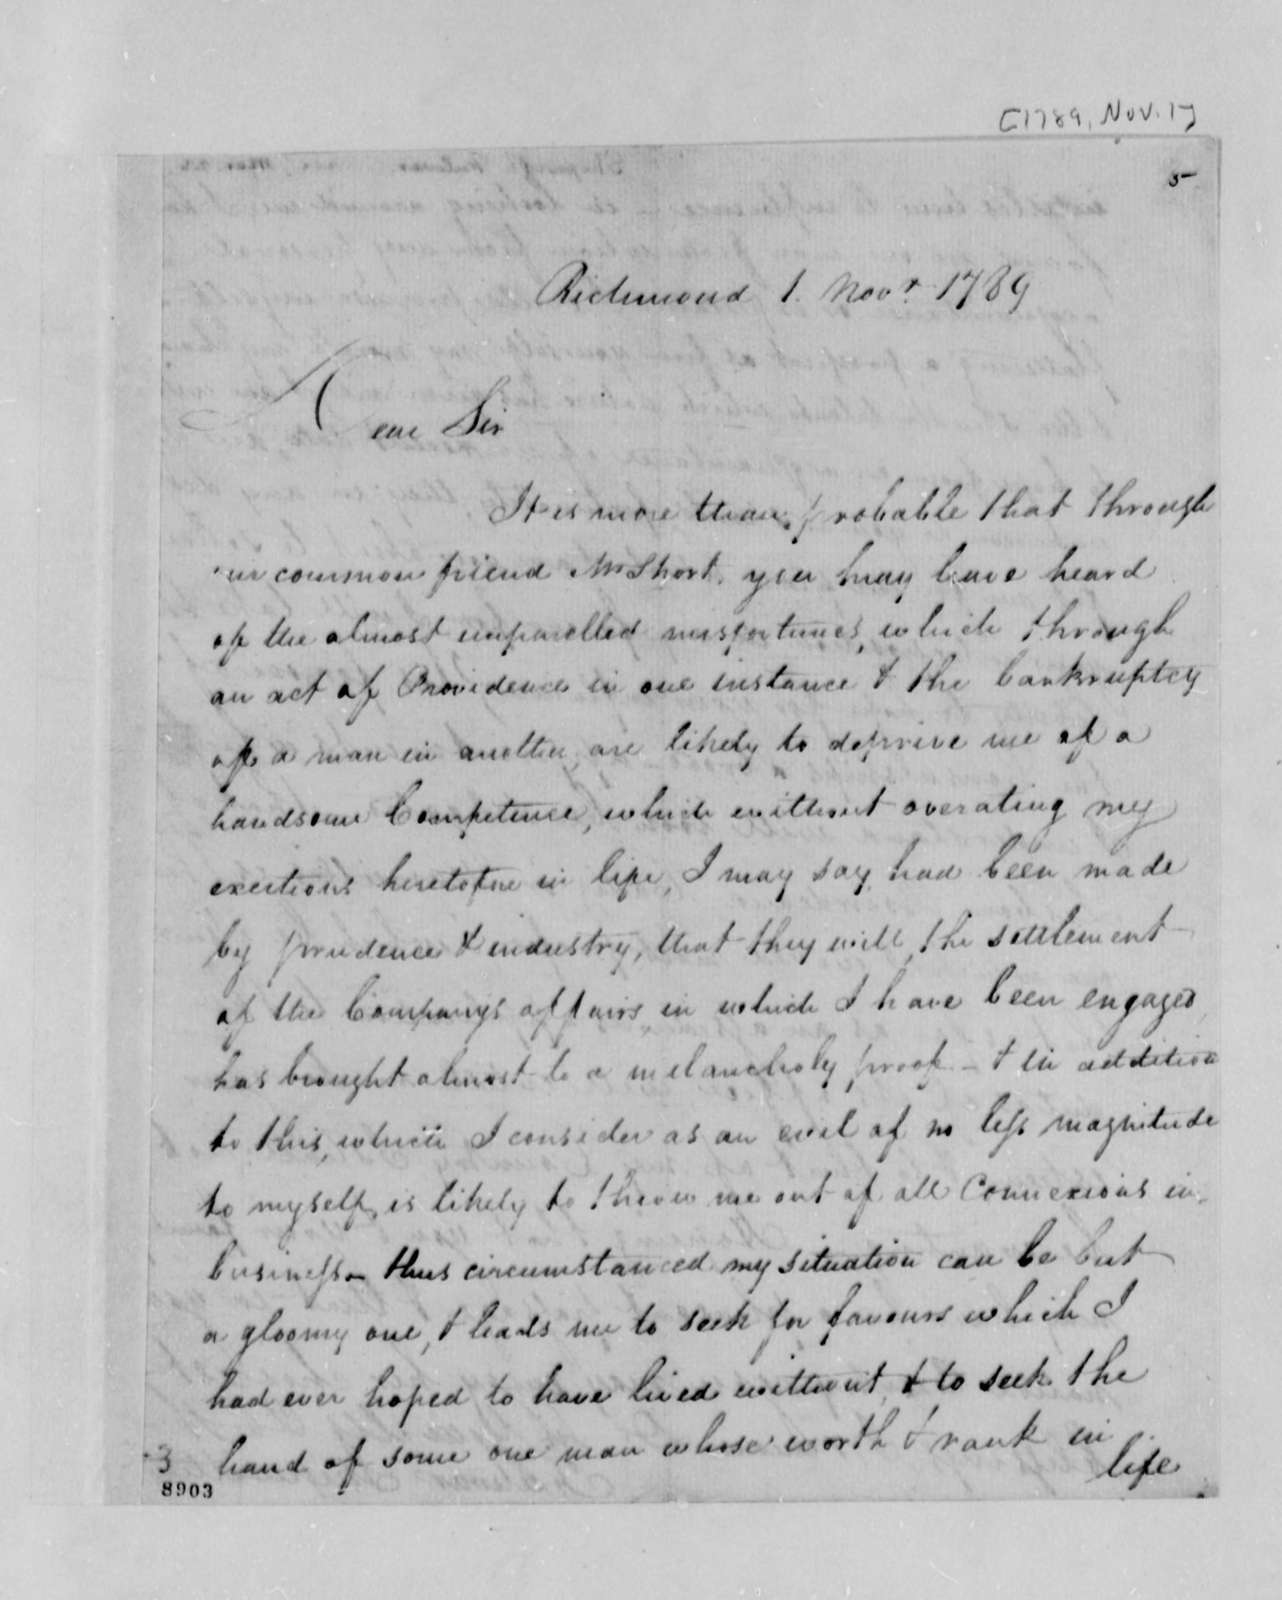 Fulwar Skipworth to Thomas Jefferson, November 1, 1789